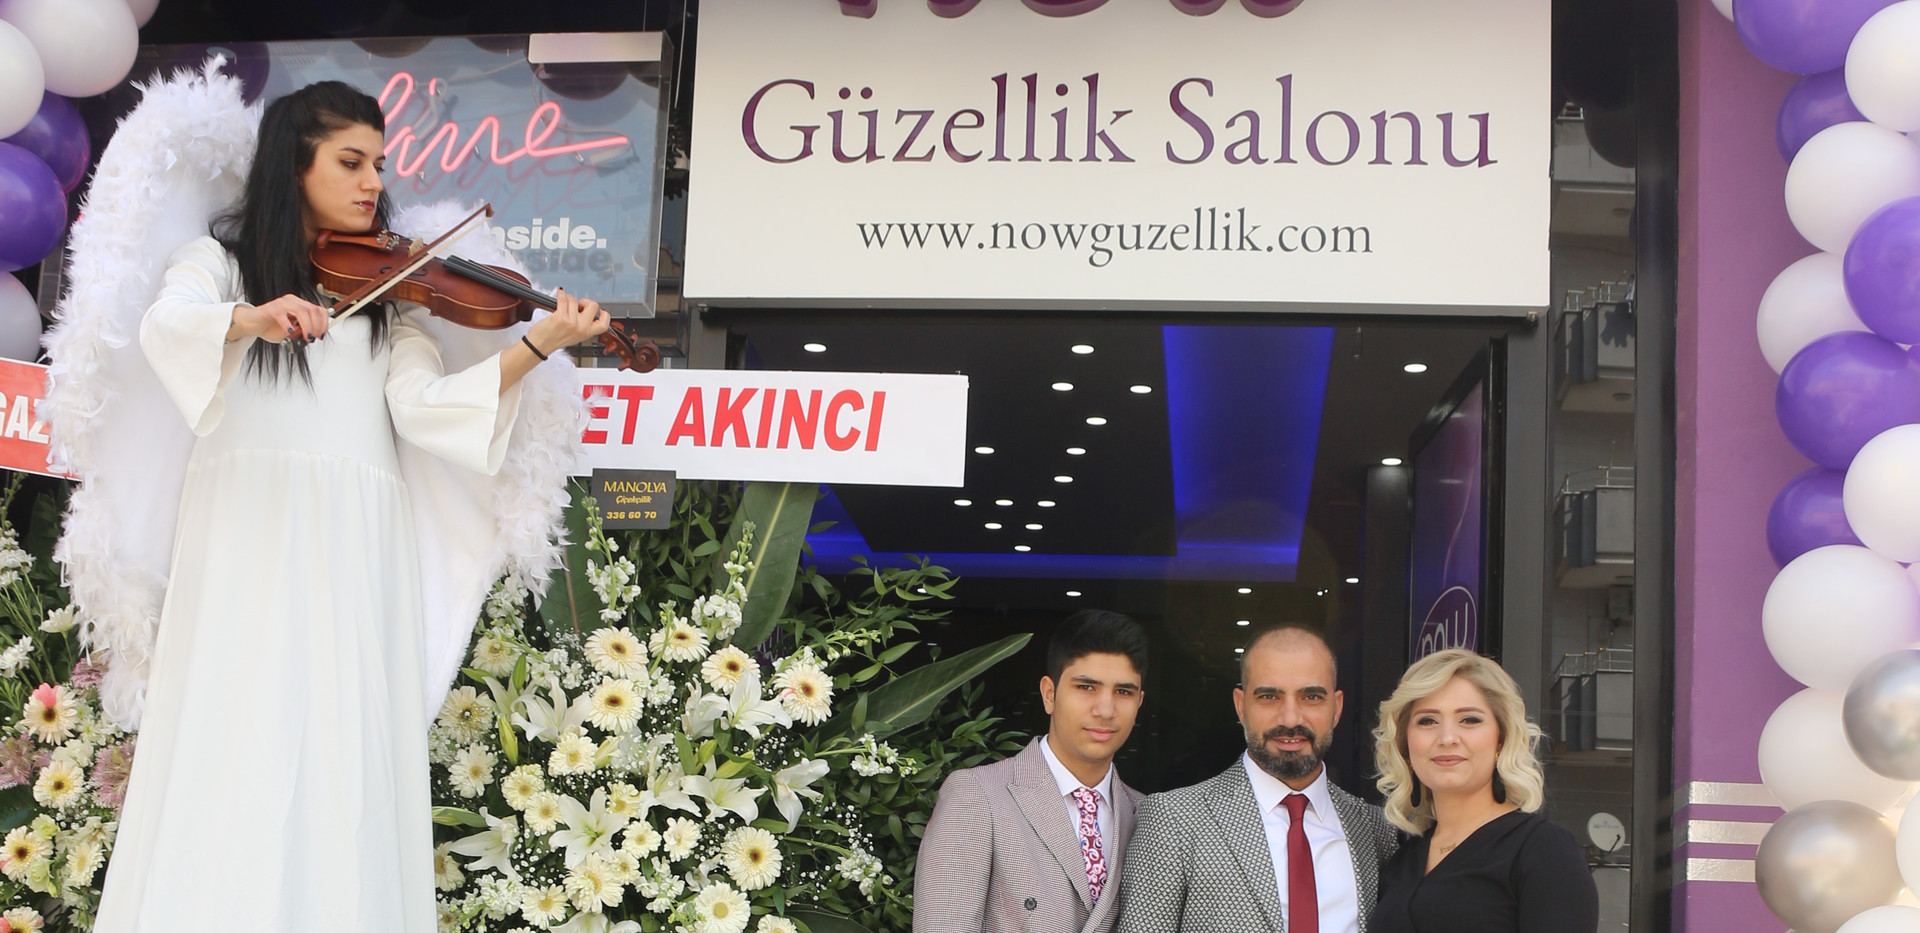 Now gaziantep Solaryum Açılışı 16